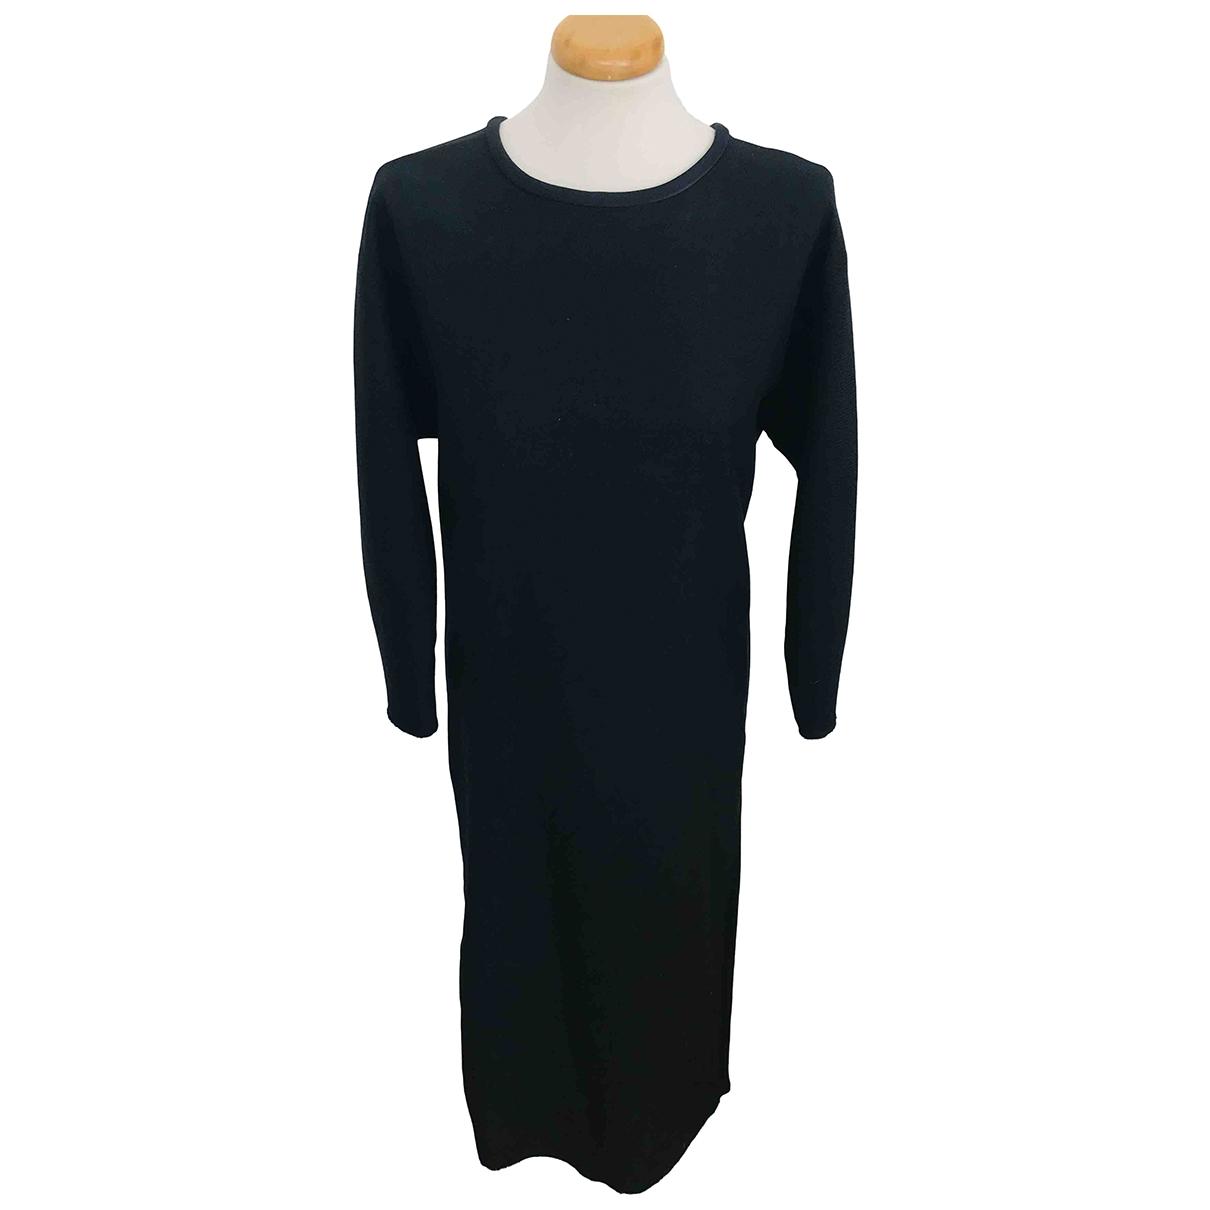 Isabel Marant \N Kleid in  Schwarz Wolle